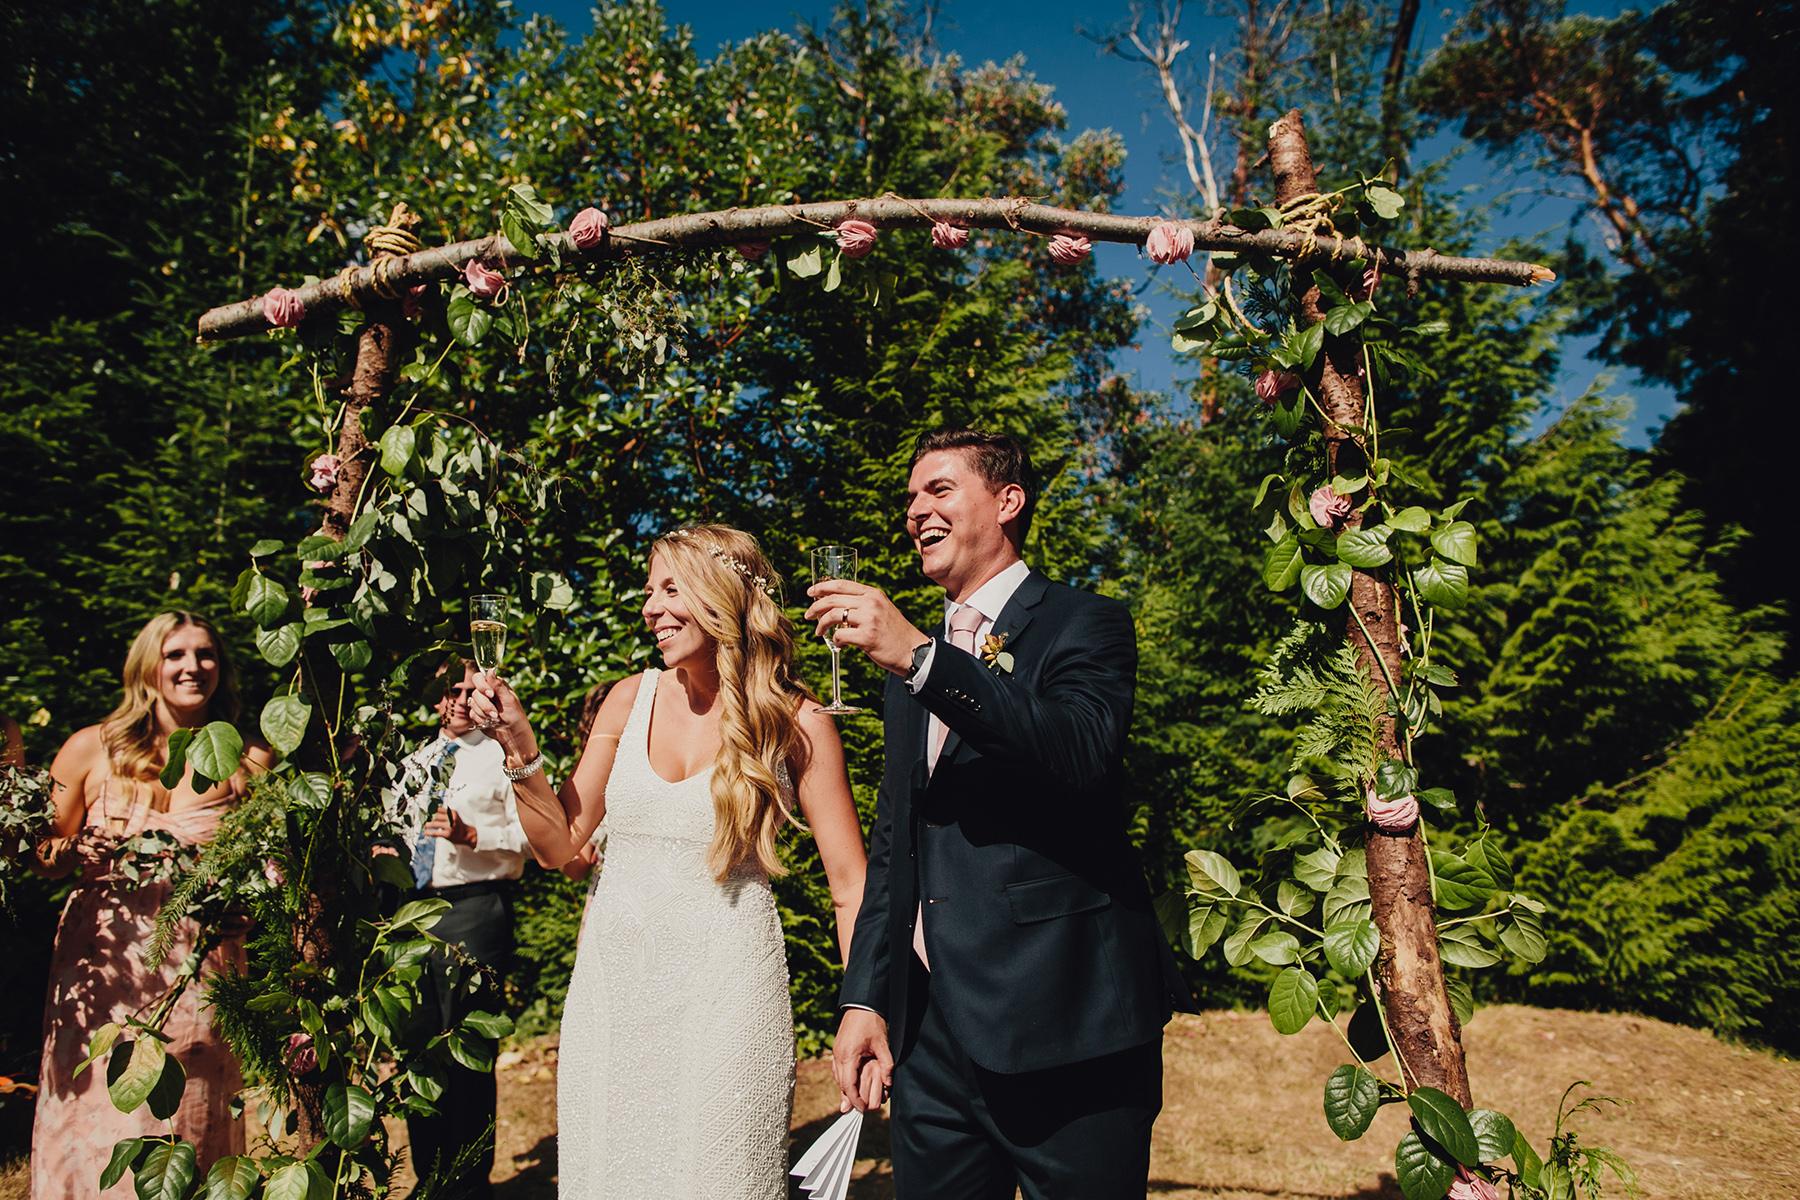 bodega-ridge-wedding-photos-0090.jpg